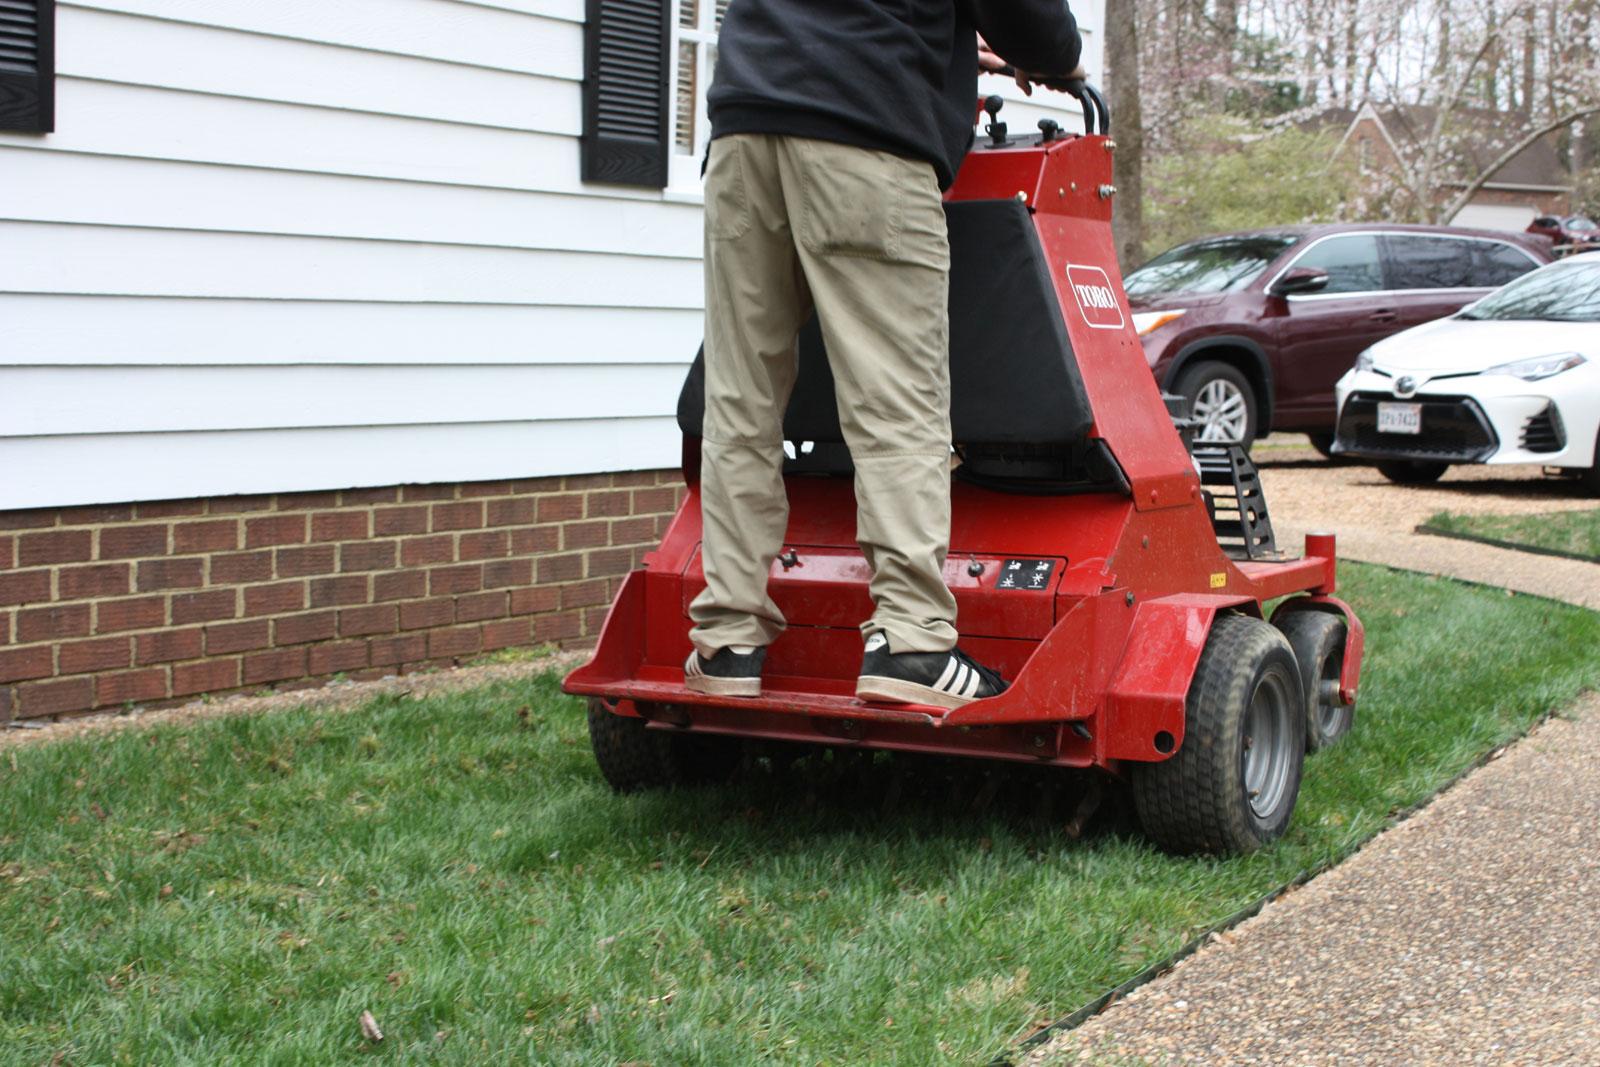 Aeration by Prestigious Turf Management - Yorktown Virginia - Lawn Treatments